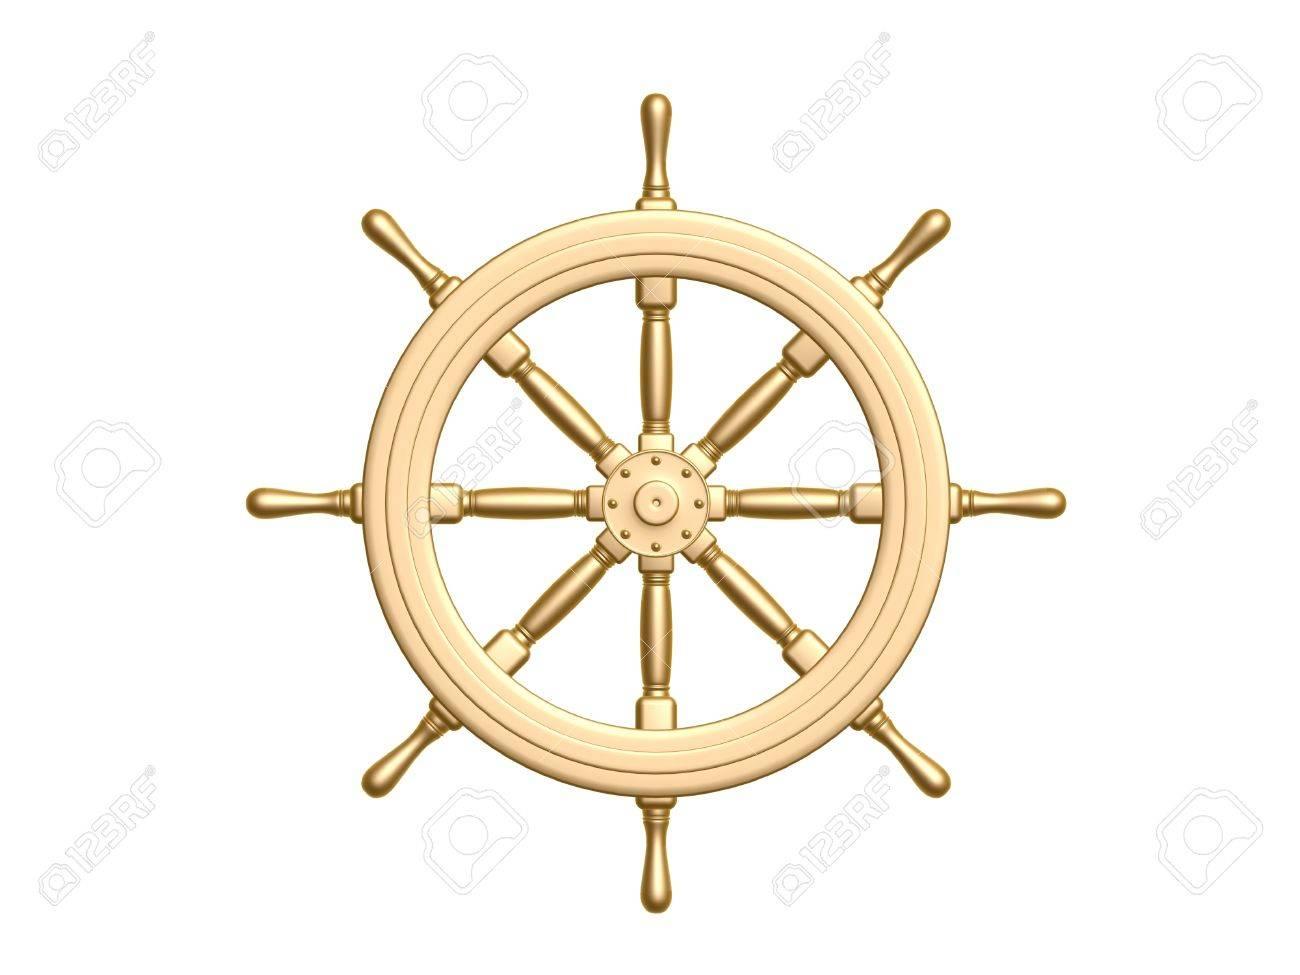 golden Steering wheel isolated on white background Stock Photo - 12321448